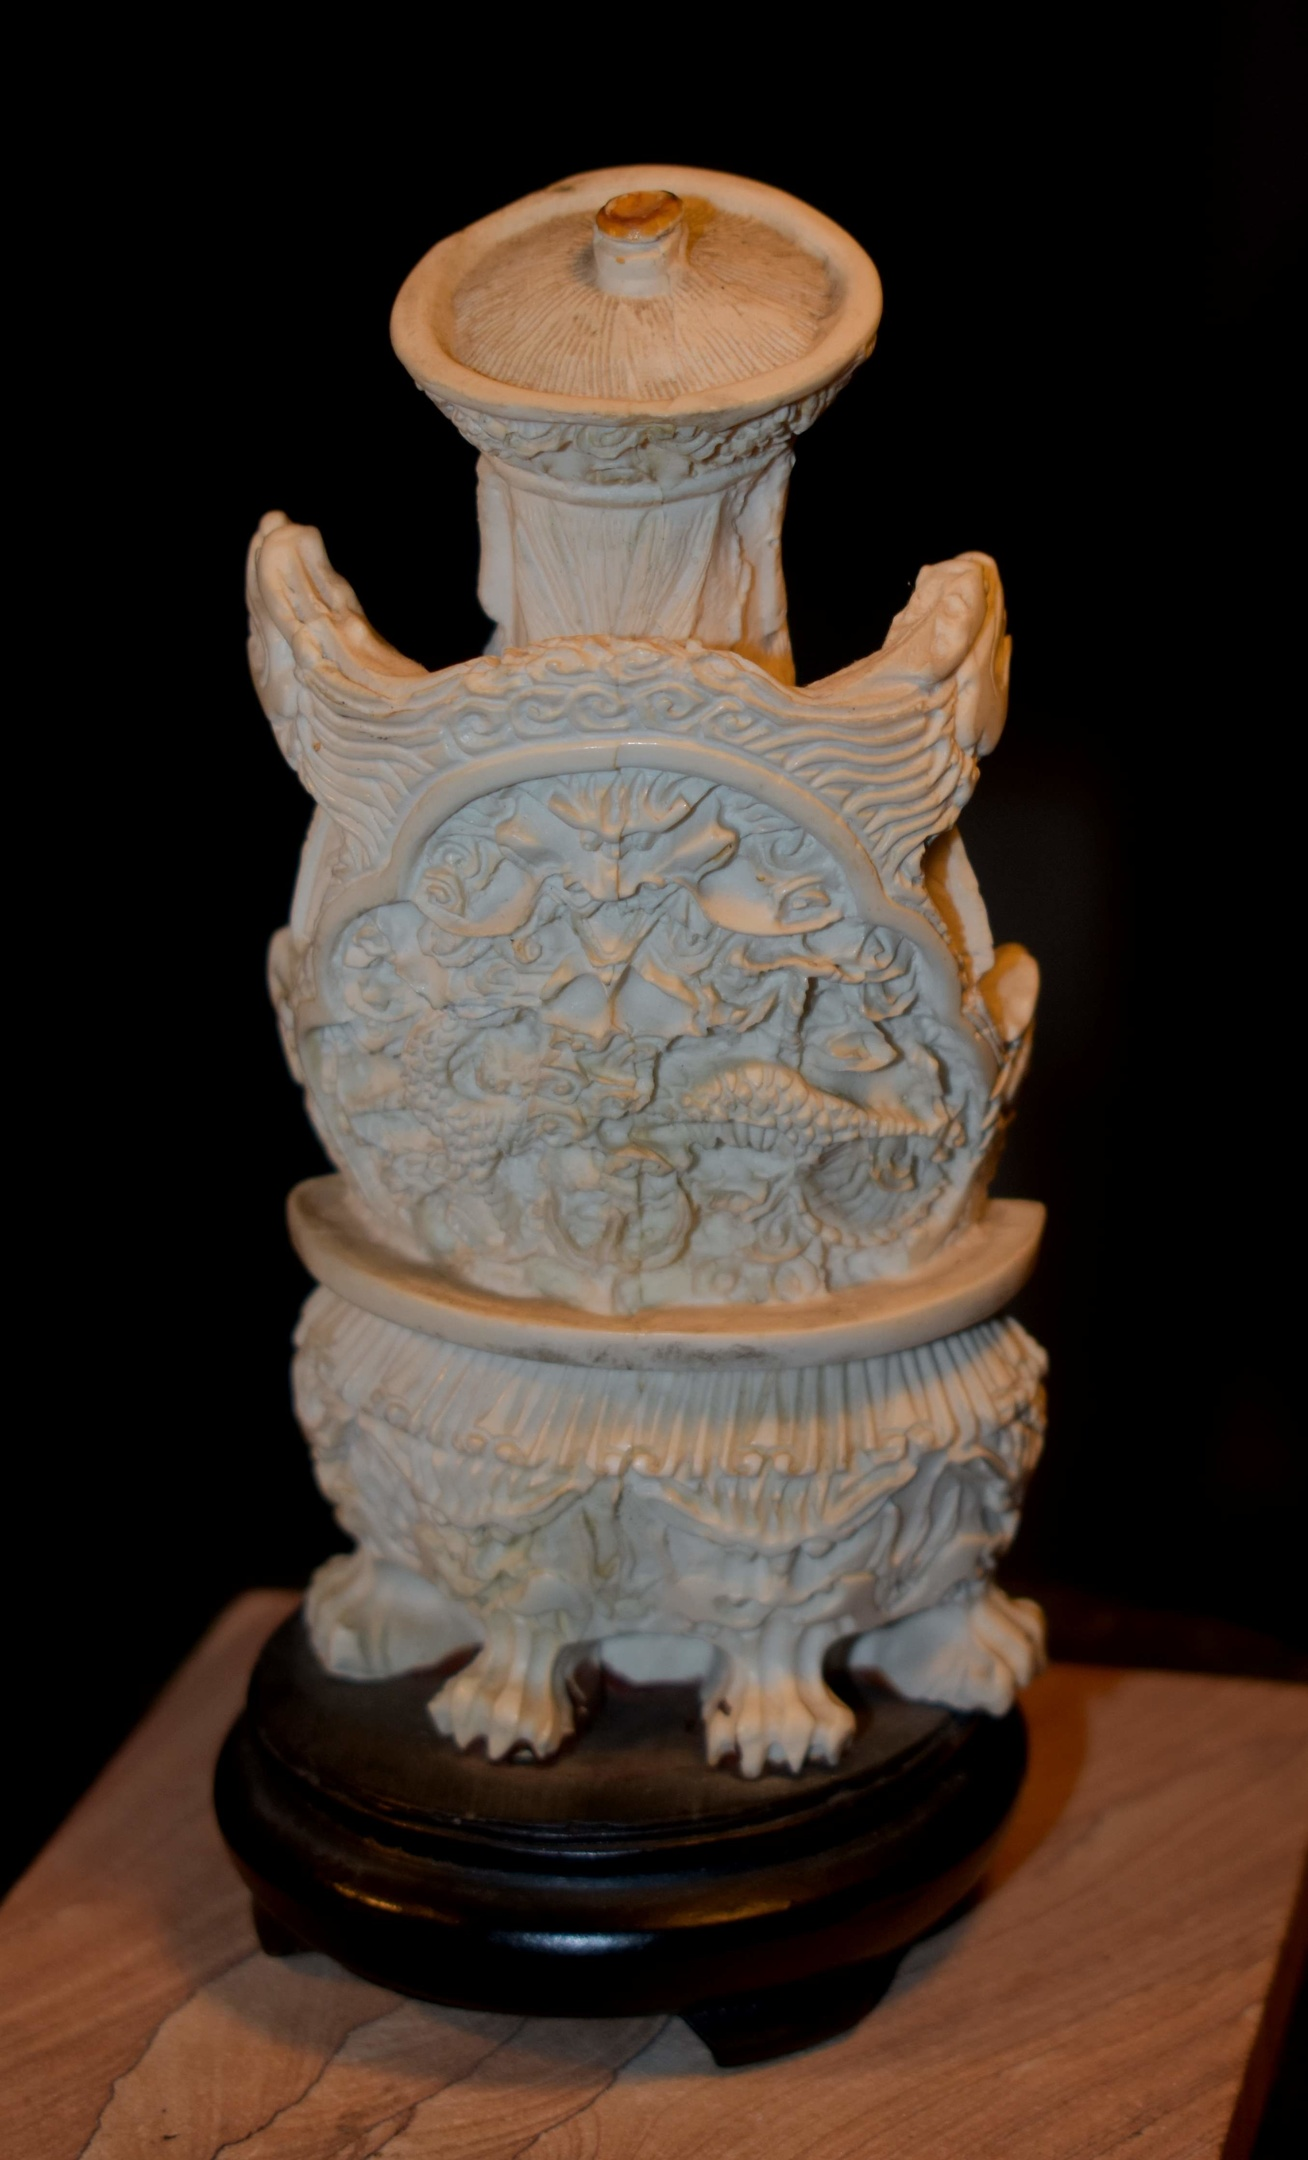 Hand Carved Statue - Emperor? Guardian? Bone? Resin? | Collectors Weekly